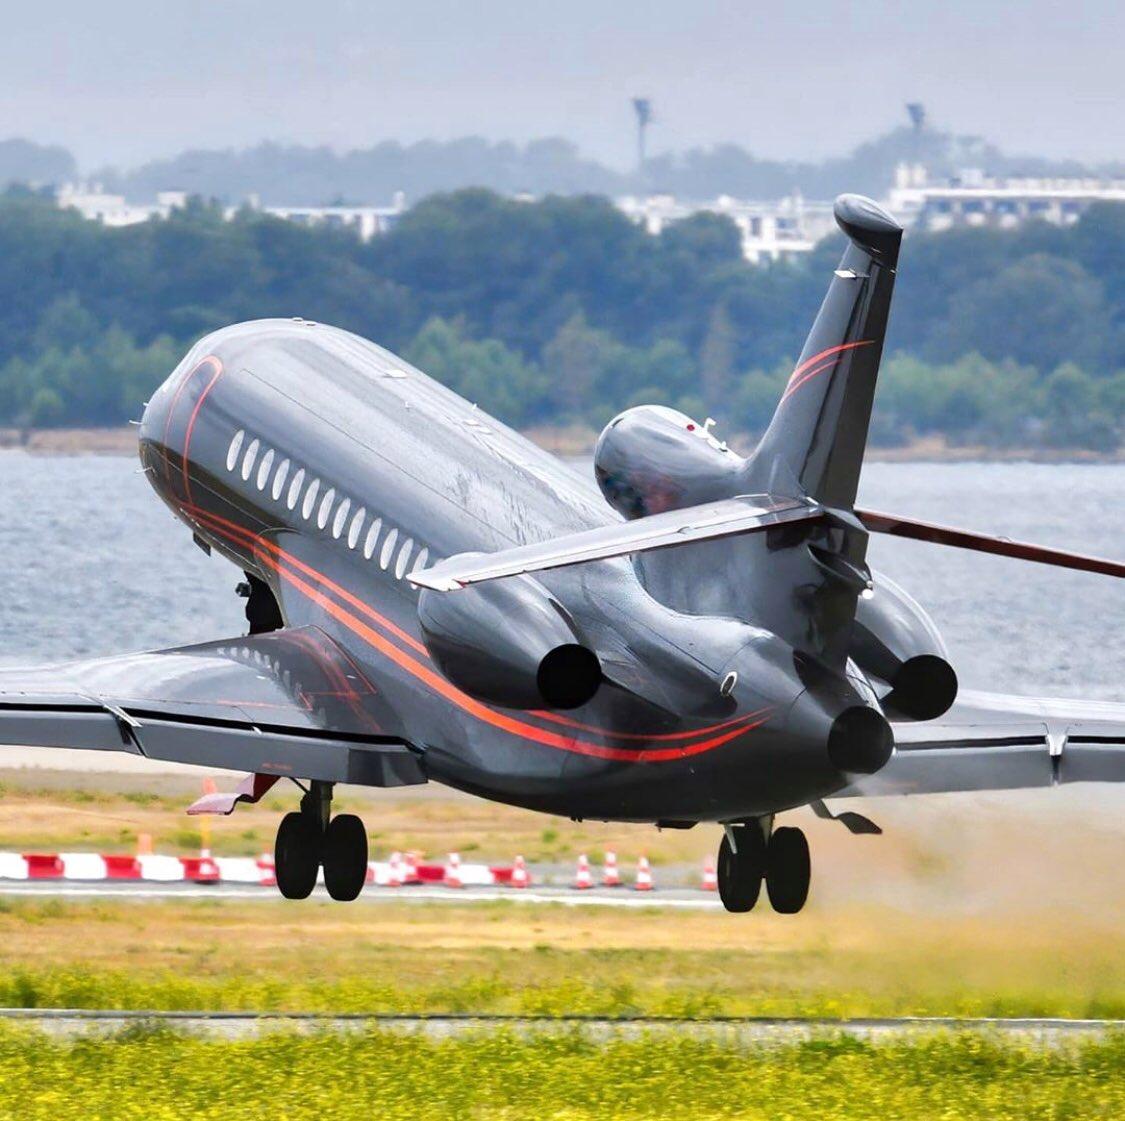 #BusinessJets @chris.planespotting ® triholer take-off #Dassault #Falcon8X #Fa8X . #instagramaviation #megaplane #BusinessAviation #FlyPrivate #PrivateJet  #CharterJet #BizJet #Flight #Luxury  #Travel #EmptyLeg #BusinessJet #CorporateJet #Aviation https://t.co/pcp8Z9Lkzu